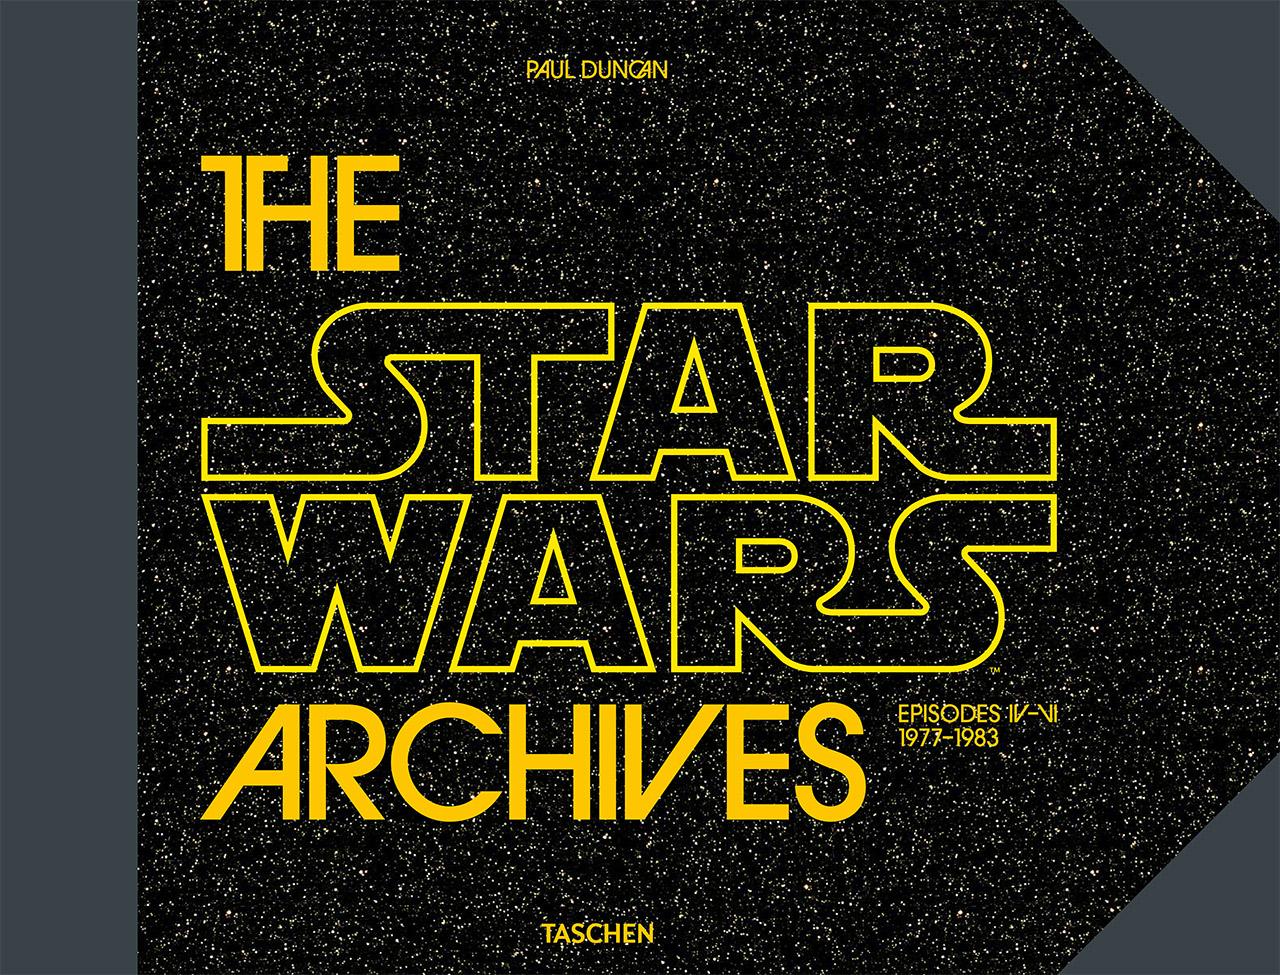 The Star Wars Archives: Episodes I-VI: 1977-1983 (30.11.2018)